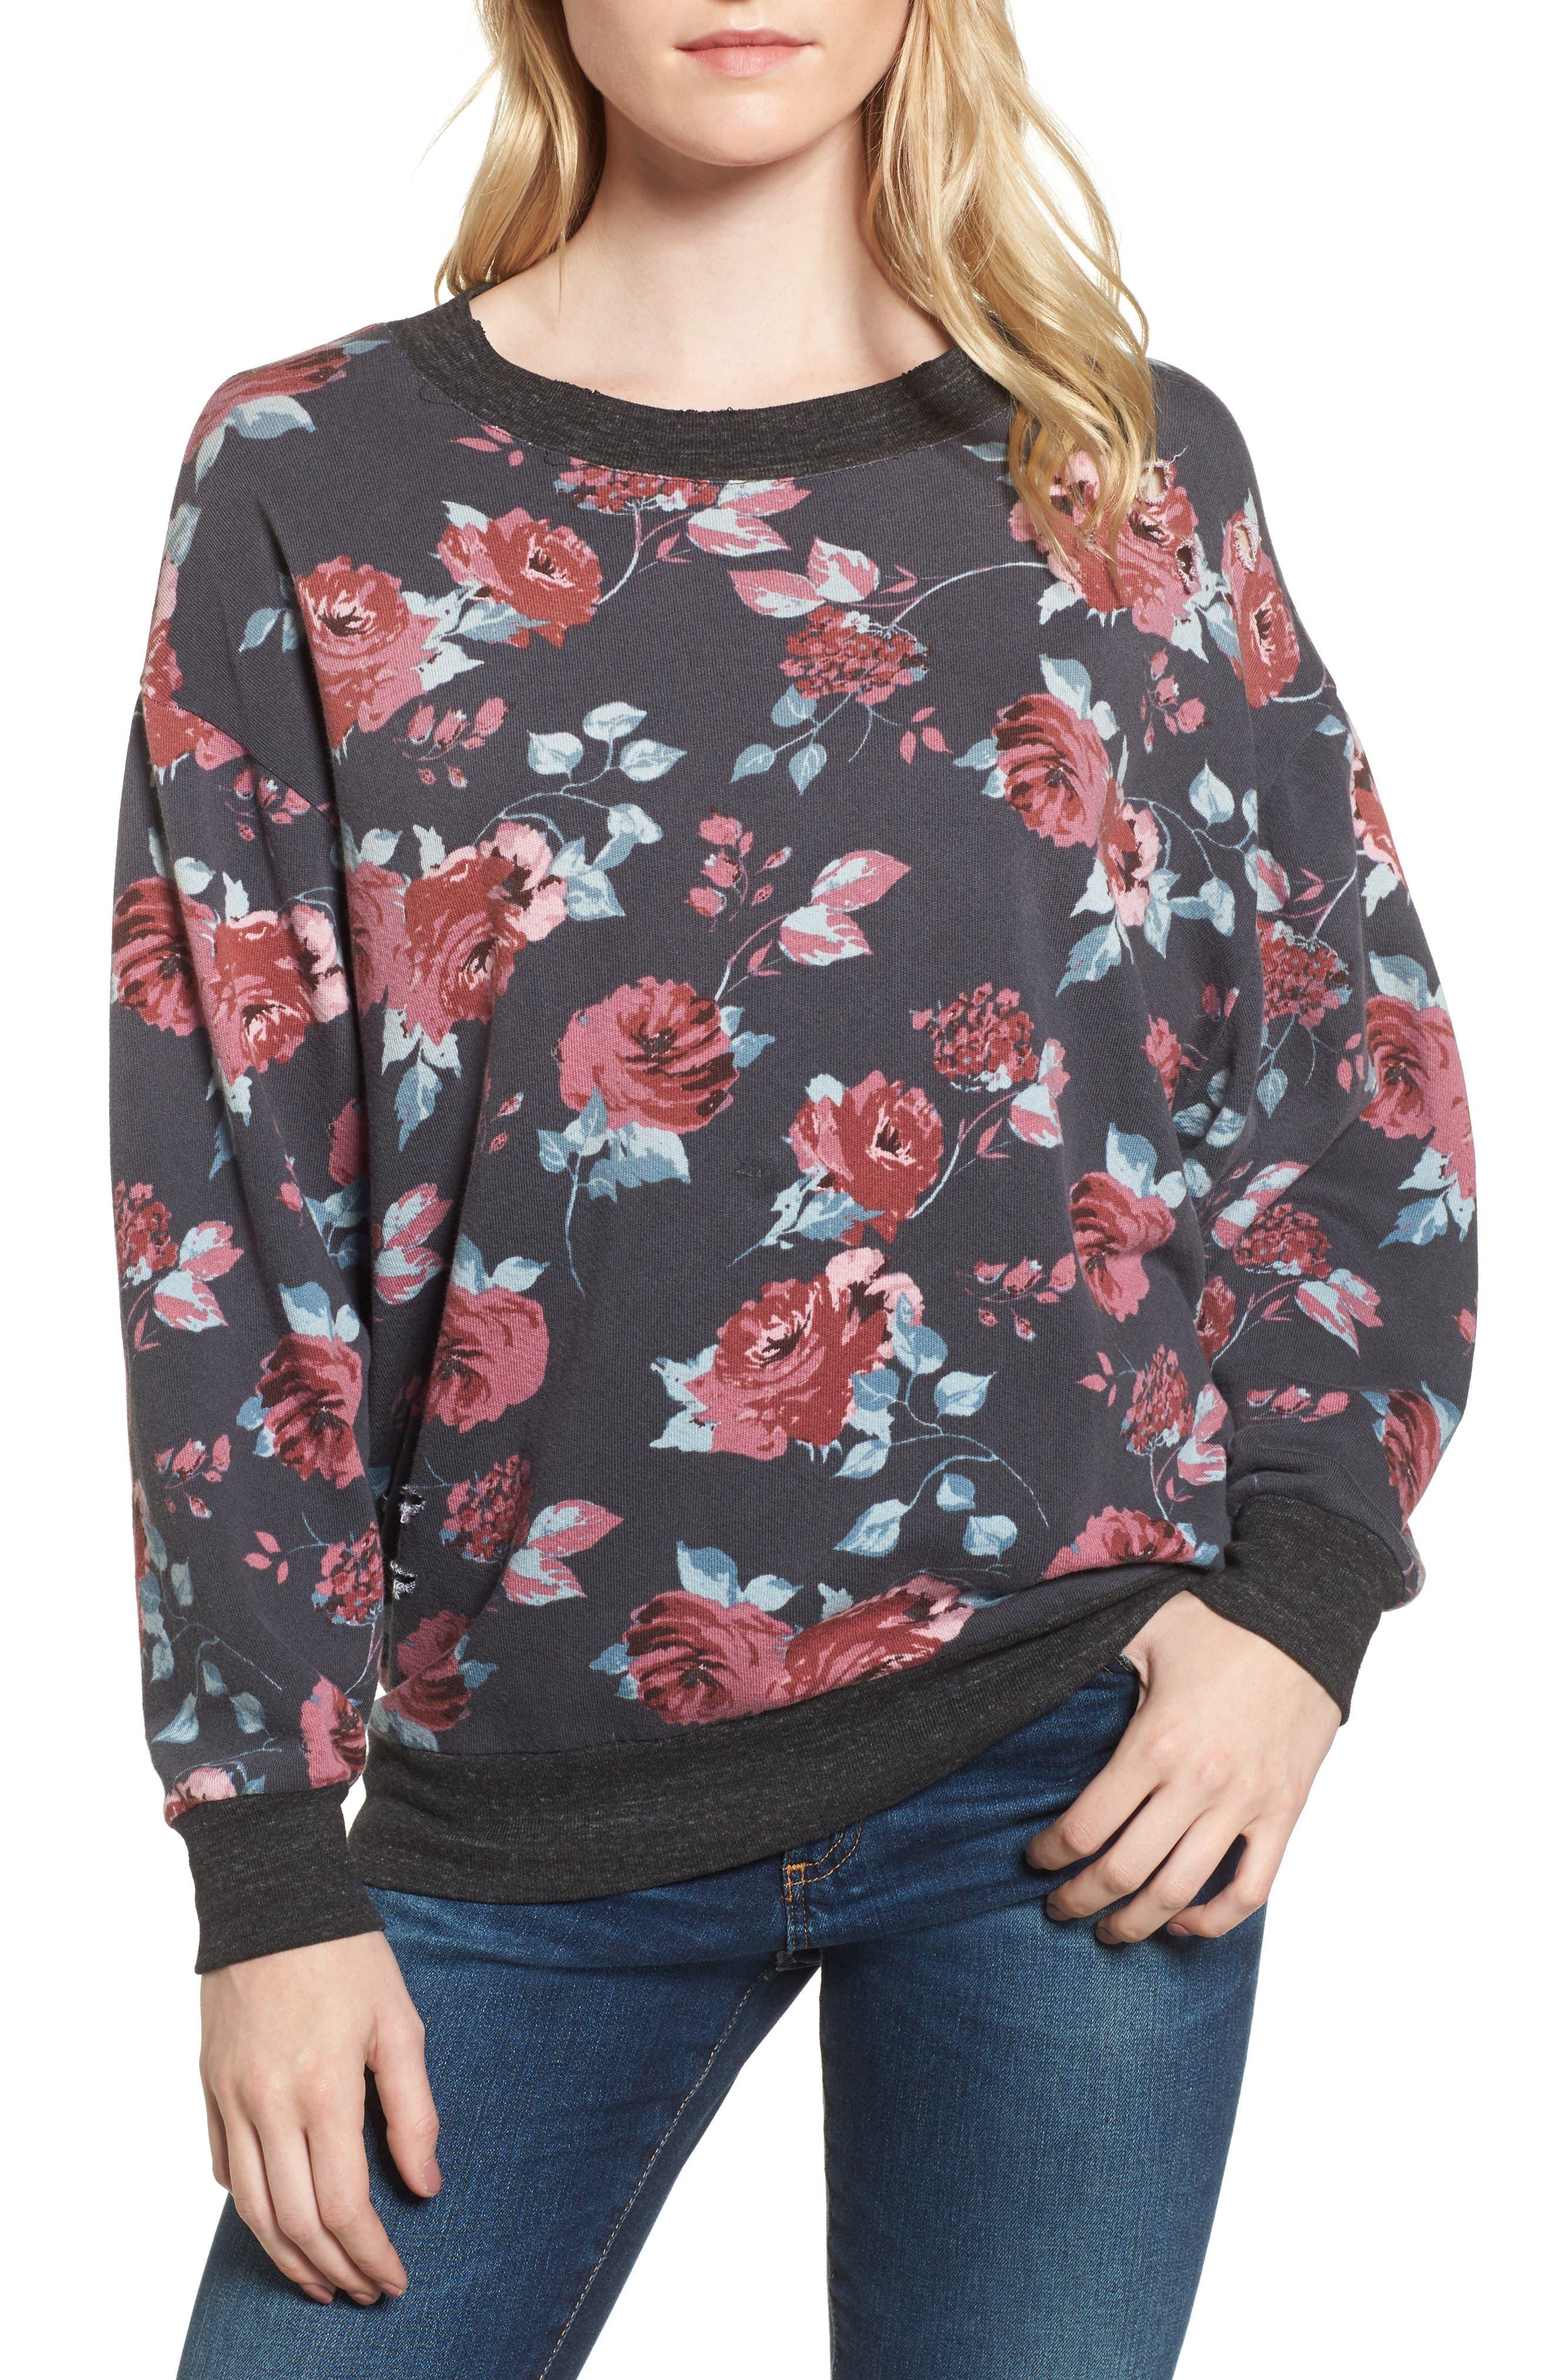 Chelsea Sweatshirt,                         Main,                         color, Pitch Black